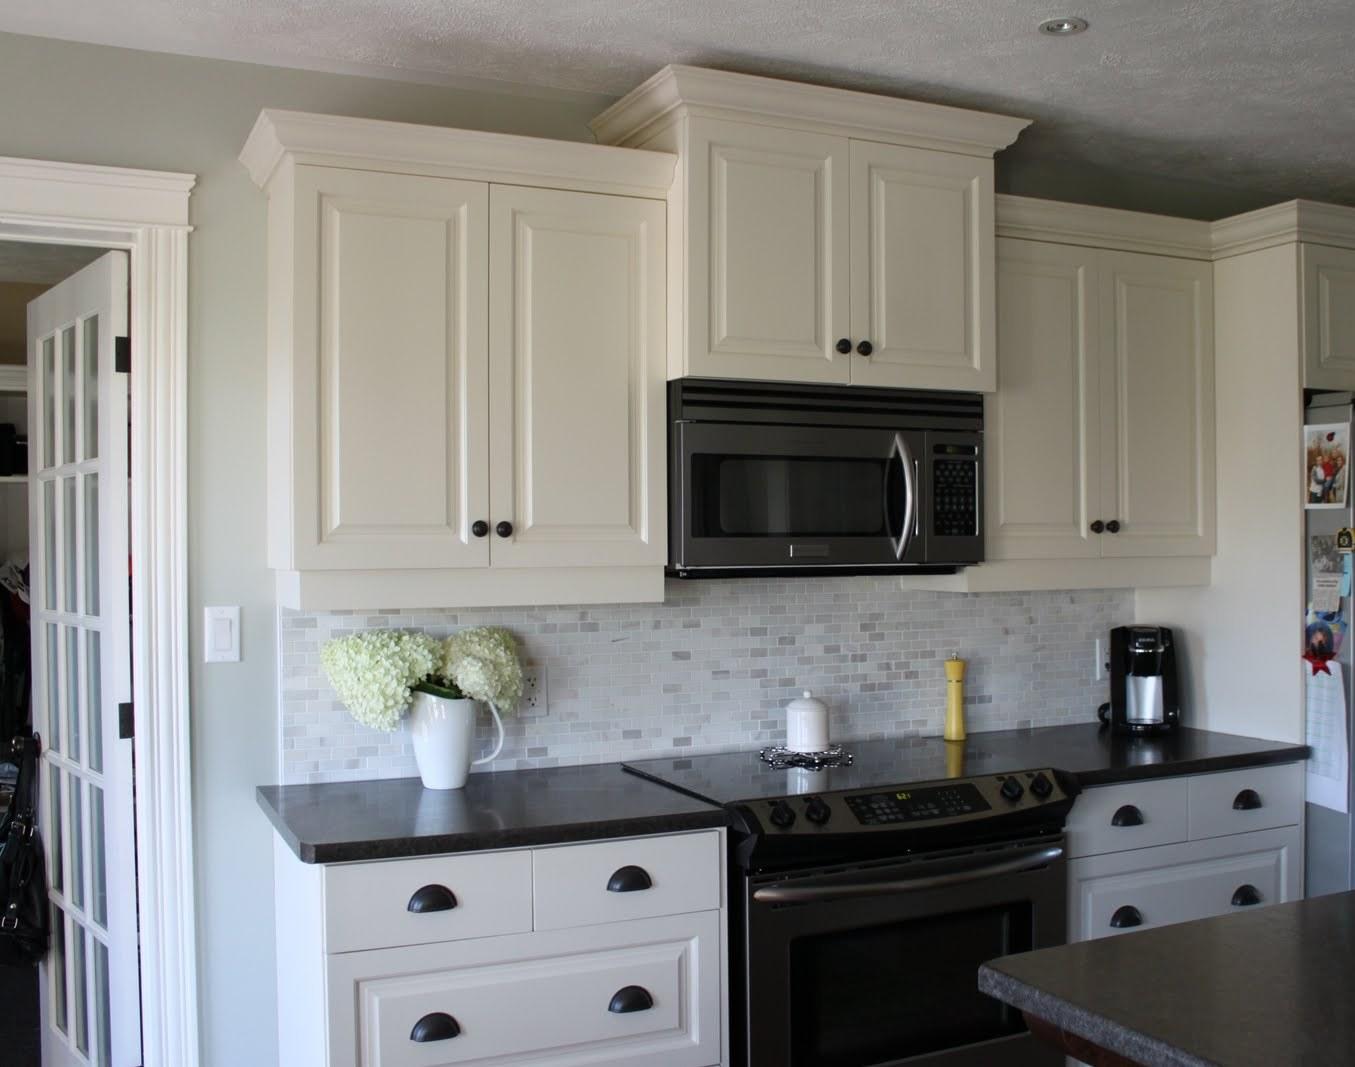 Kitchen Backsplash Ideas For Dark Cabinets And White Countertops Novocom Top